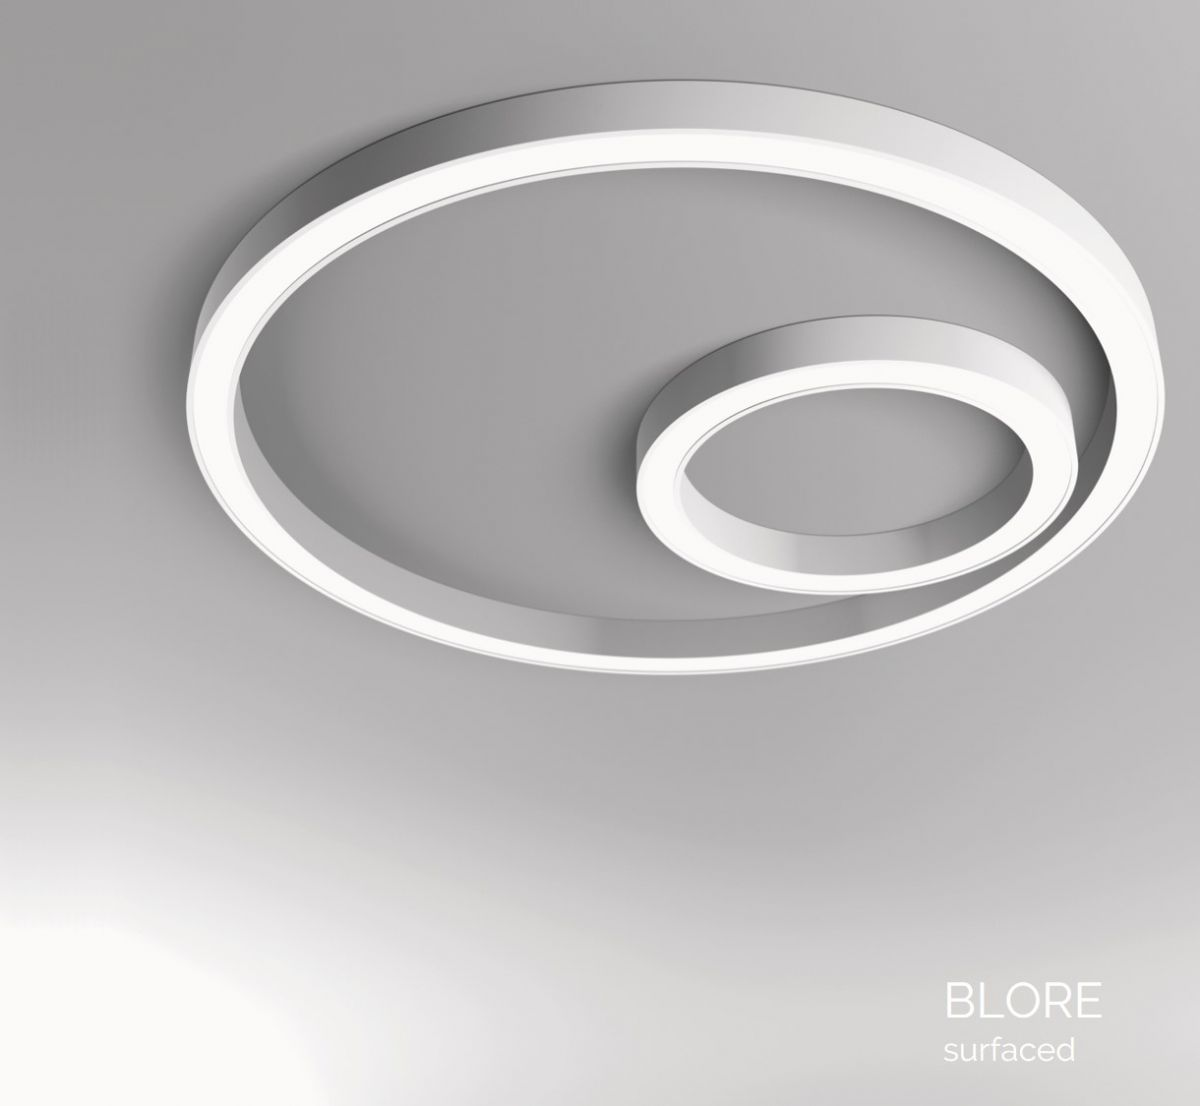 blore 111 surfaced luminaire round 1200mm 4000k 8741lm 105w fix